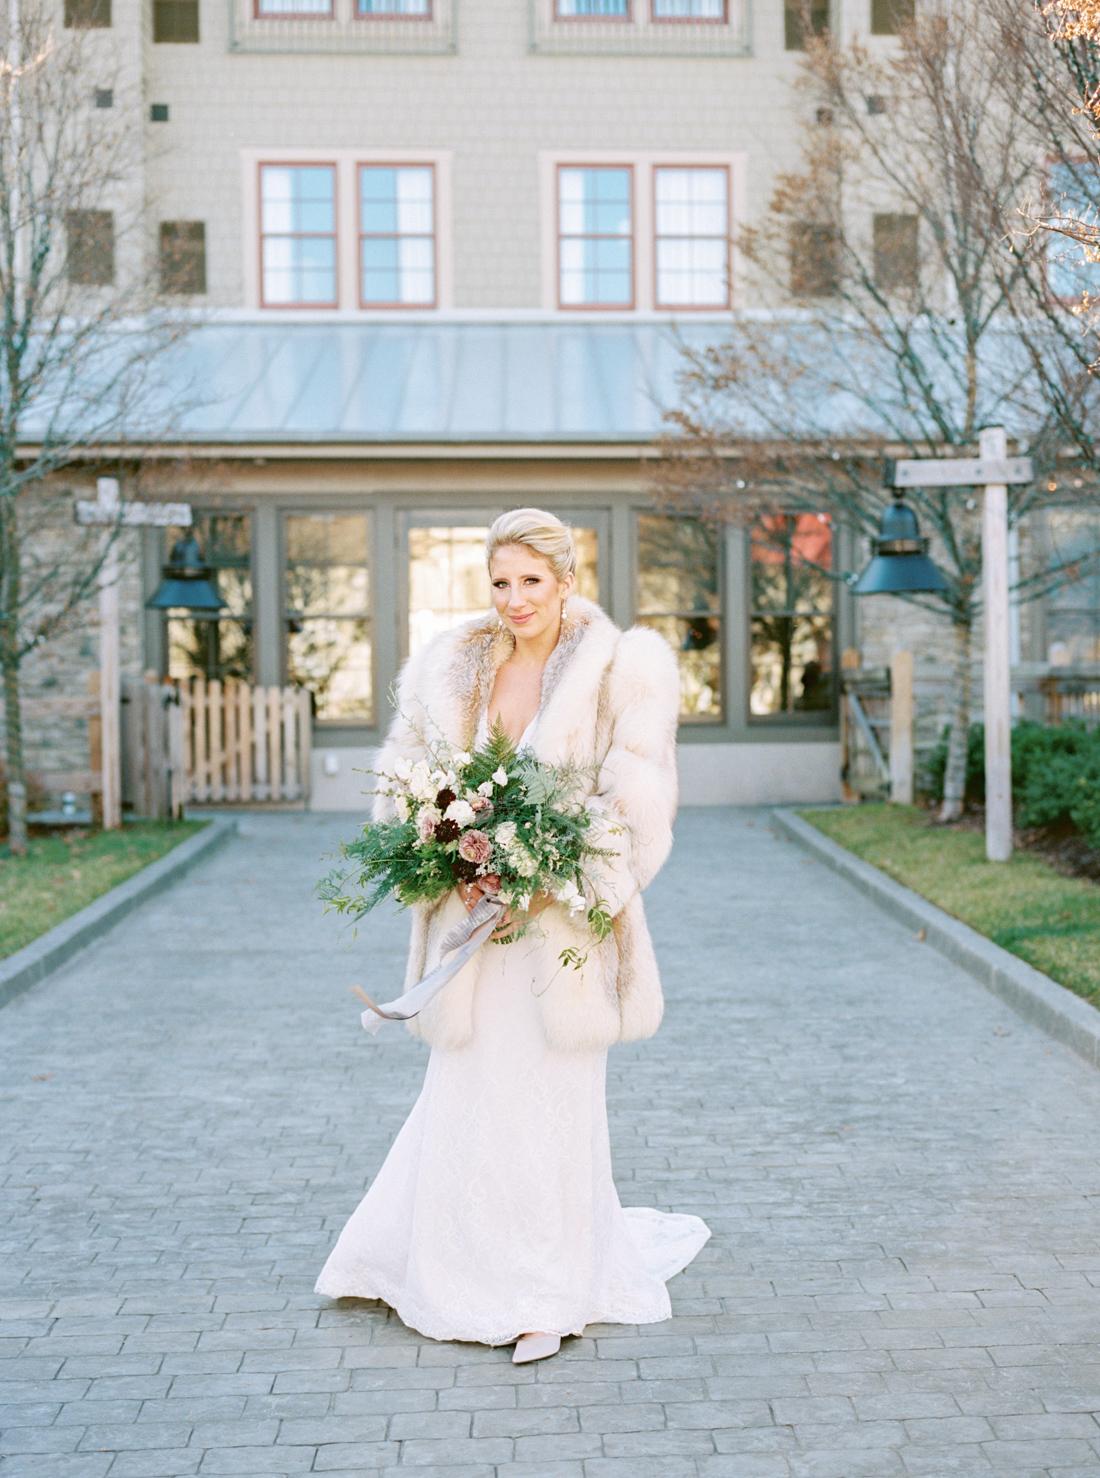 Justin-alexander-winter-wedding-dress